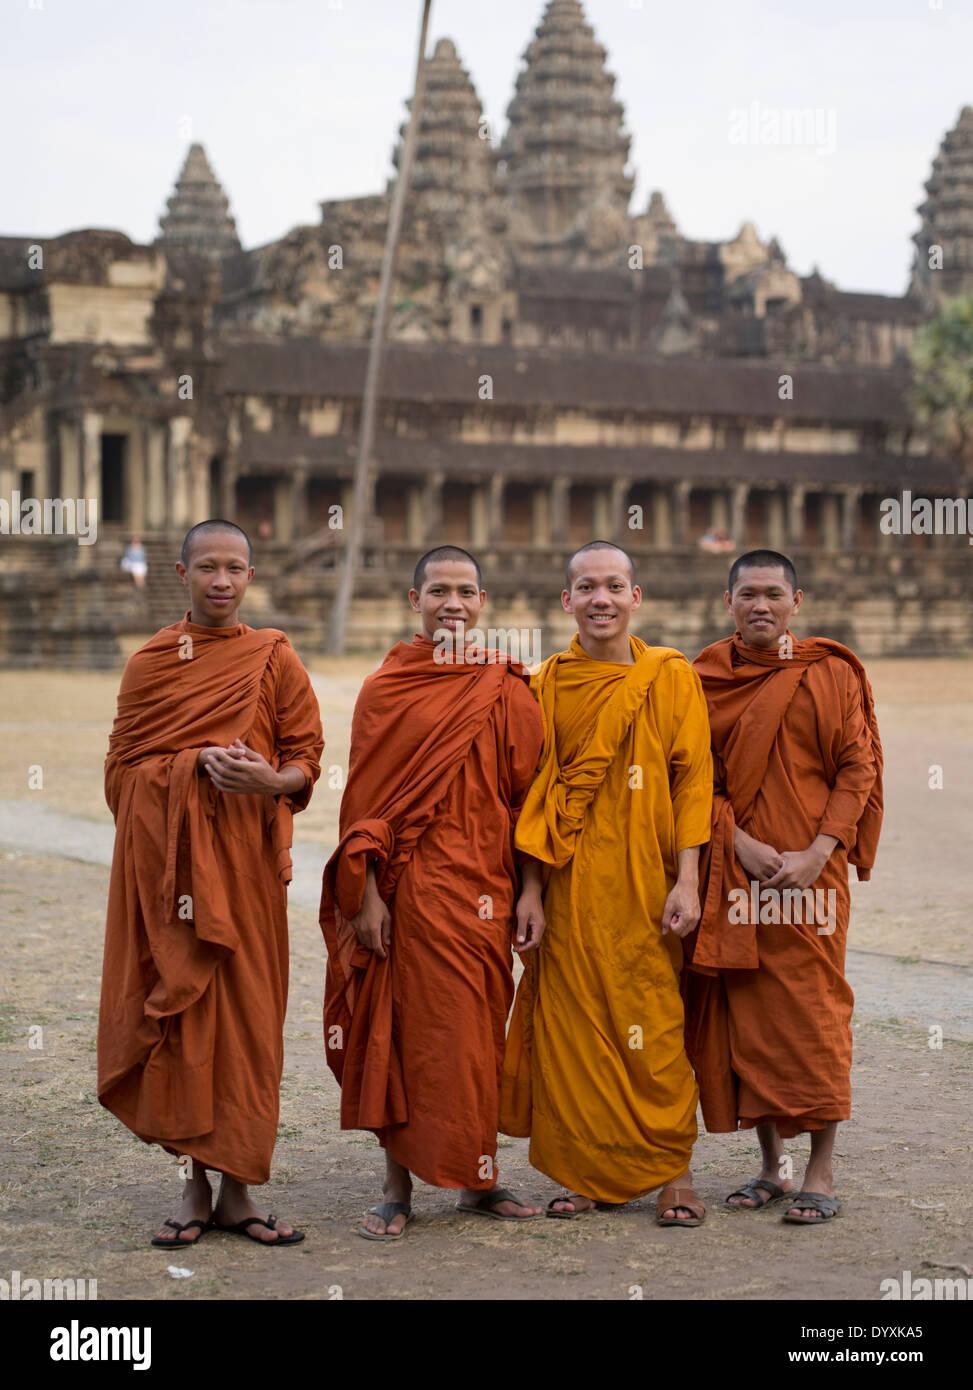 Cambodia Traditional Clothing Dress Stock Photos